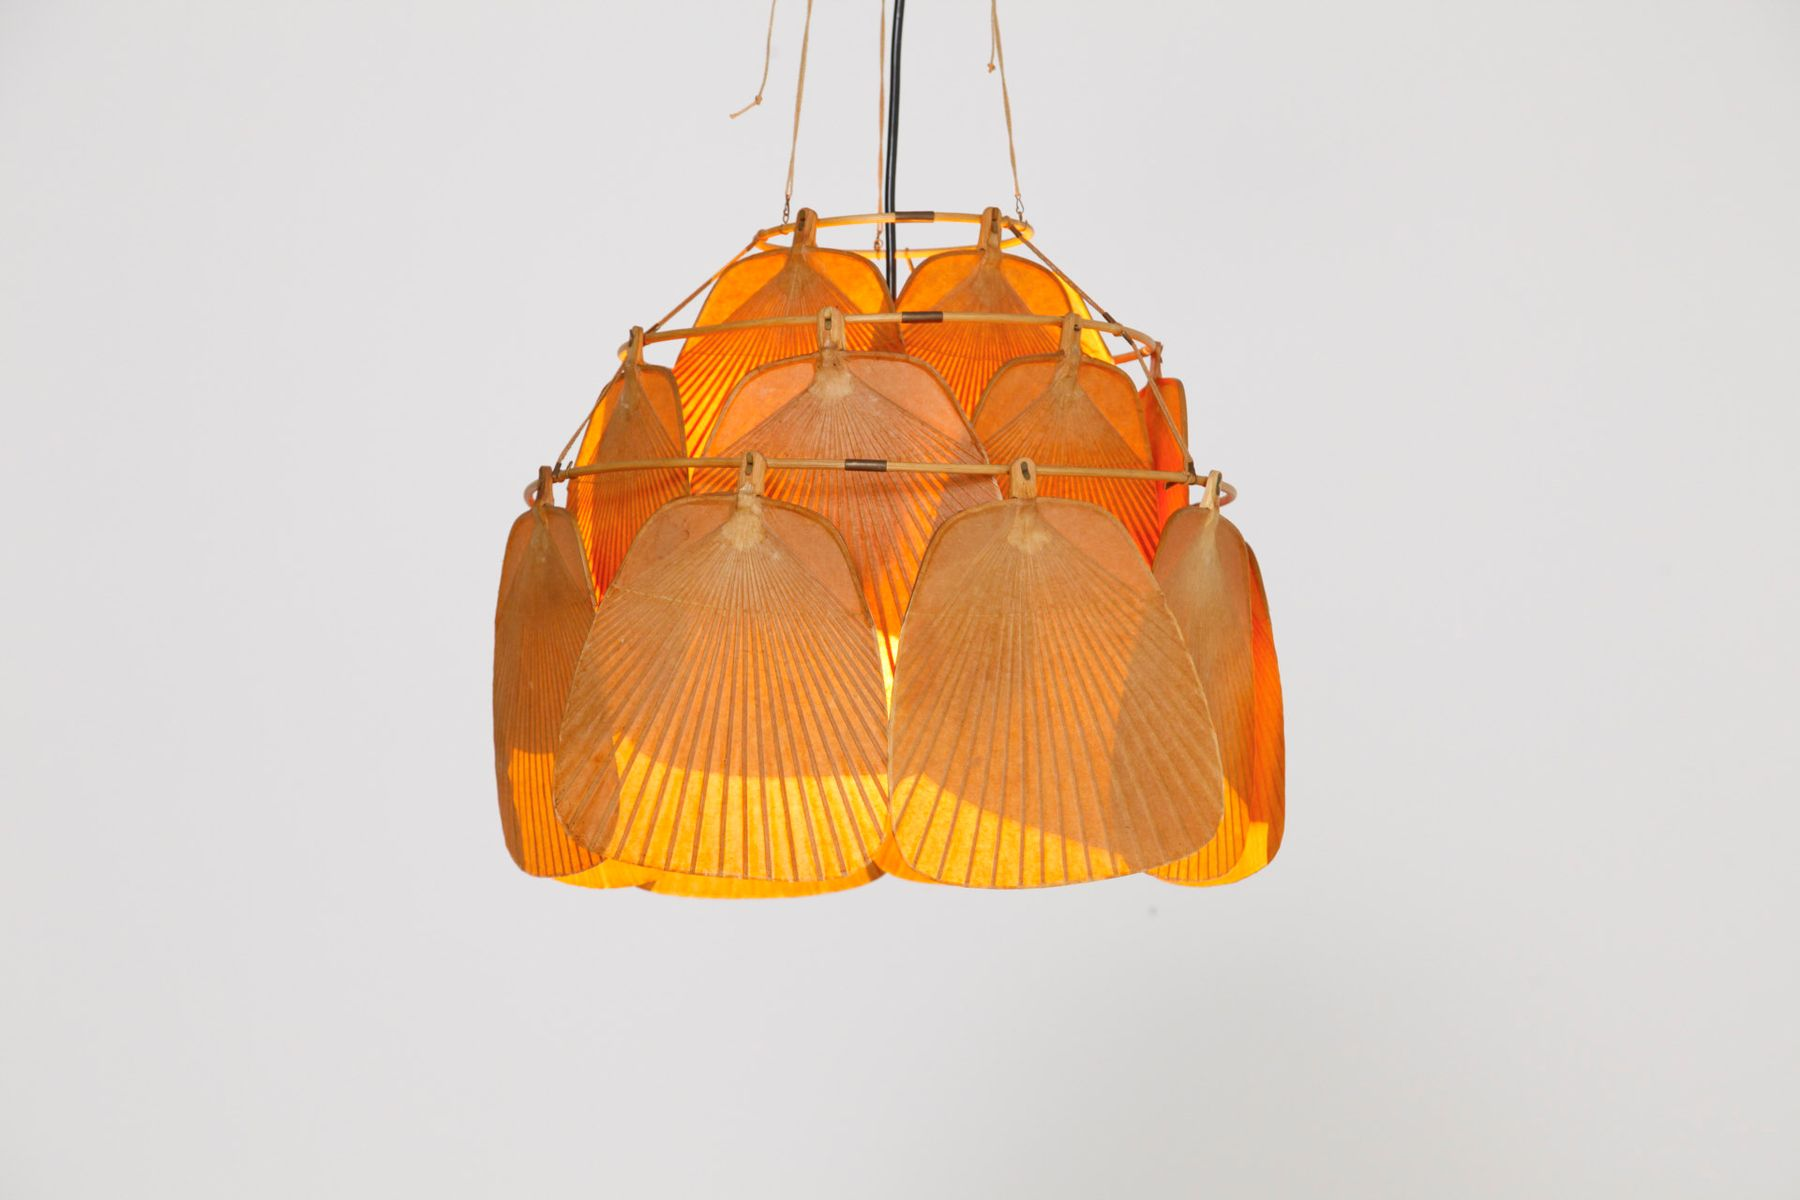 uchiwa fan lamp by ingo maurer 1975 for sale at pamono. Black Bedroom Furniture Sets. Home Design Ideas